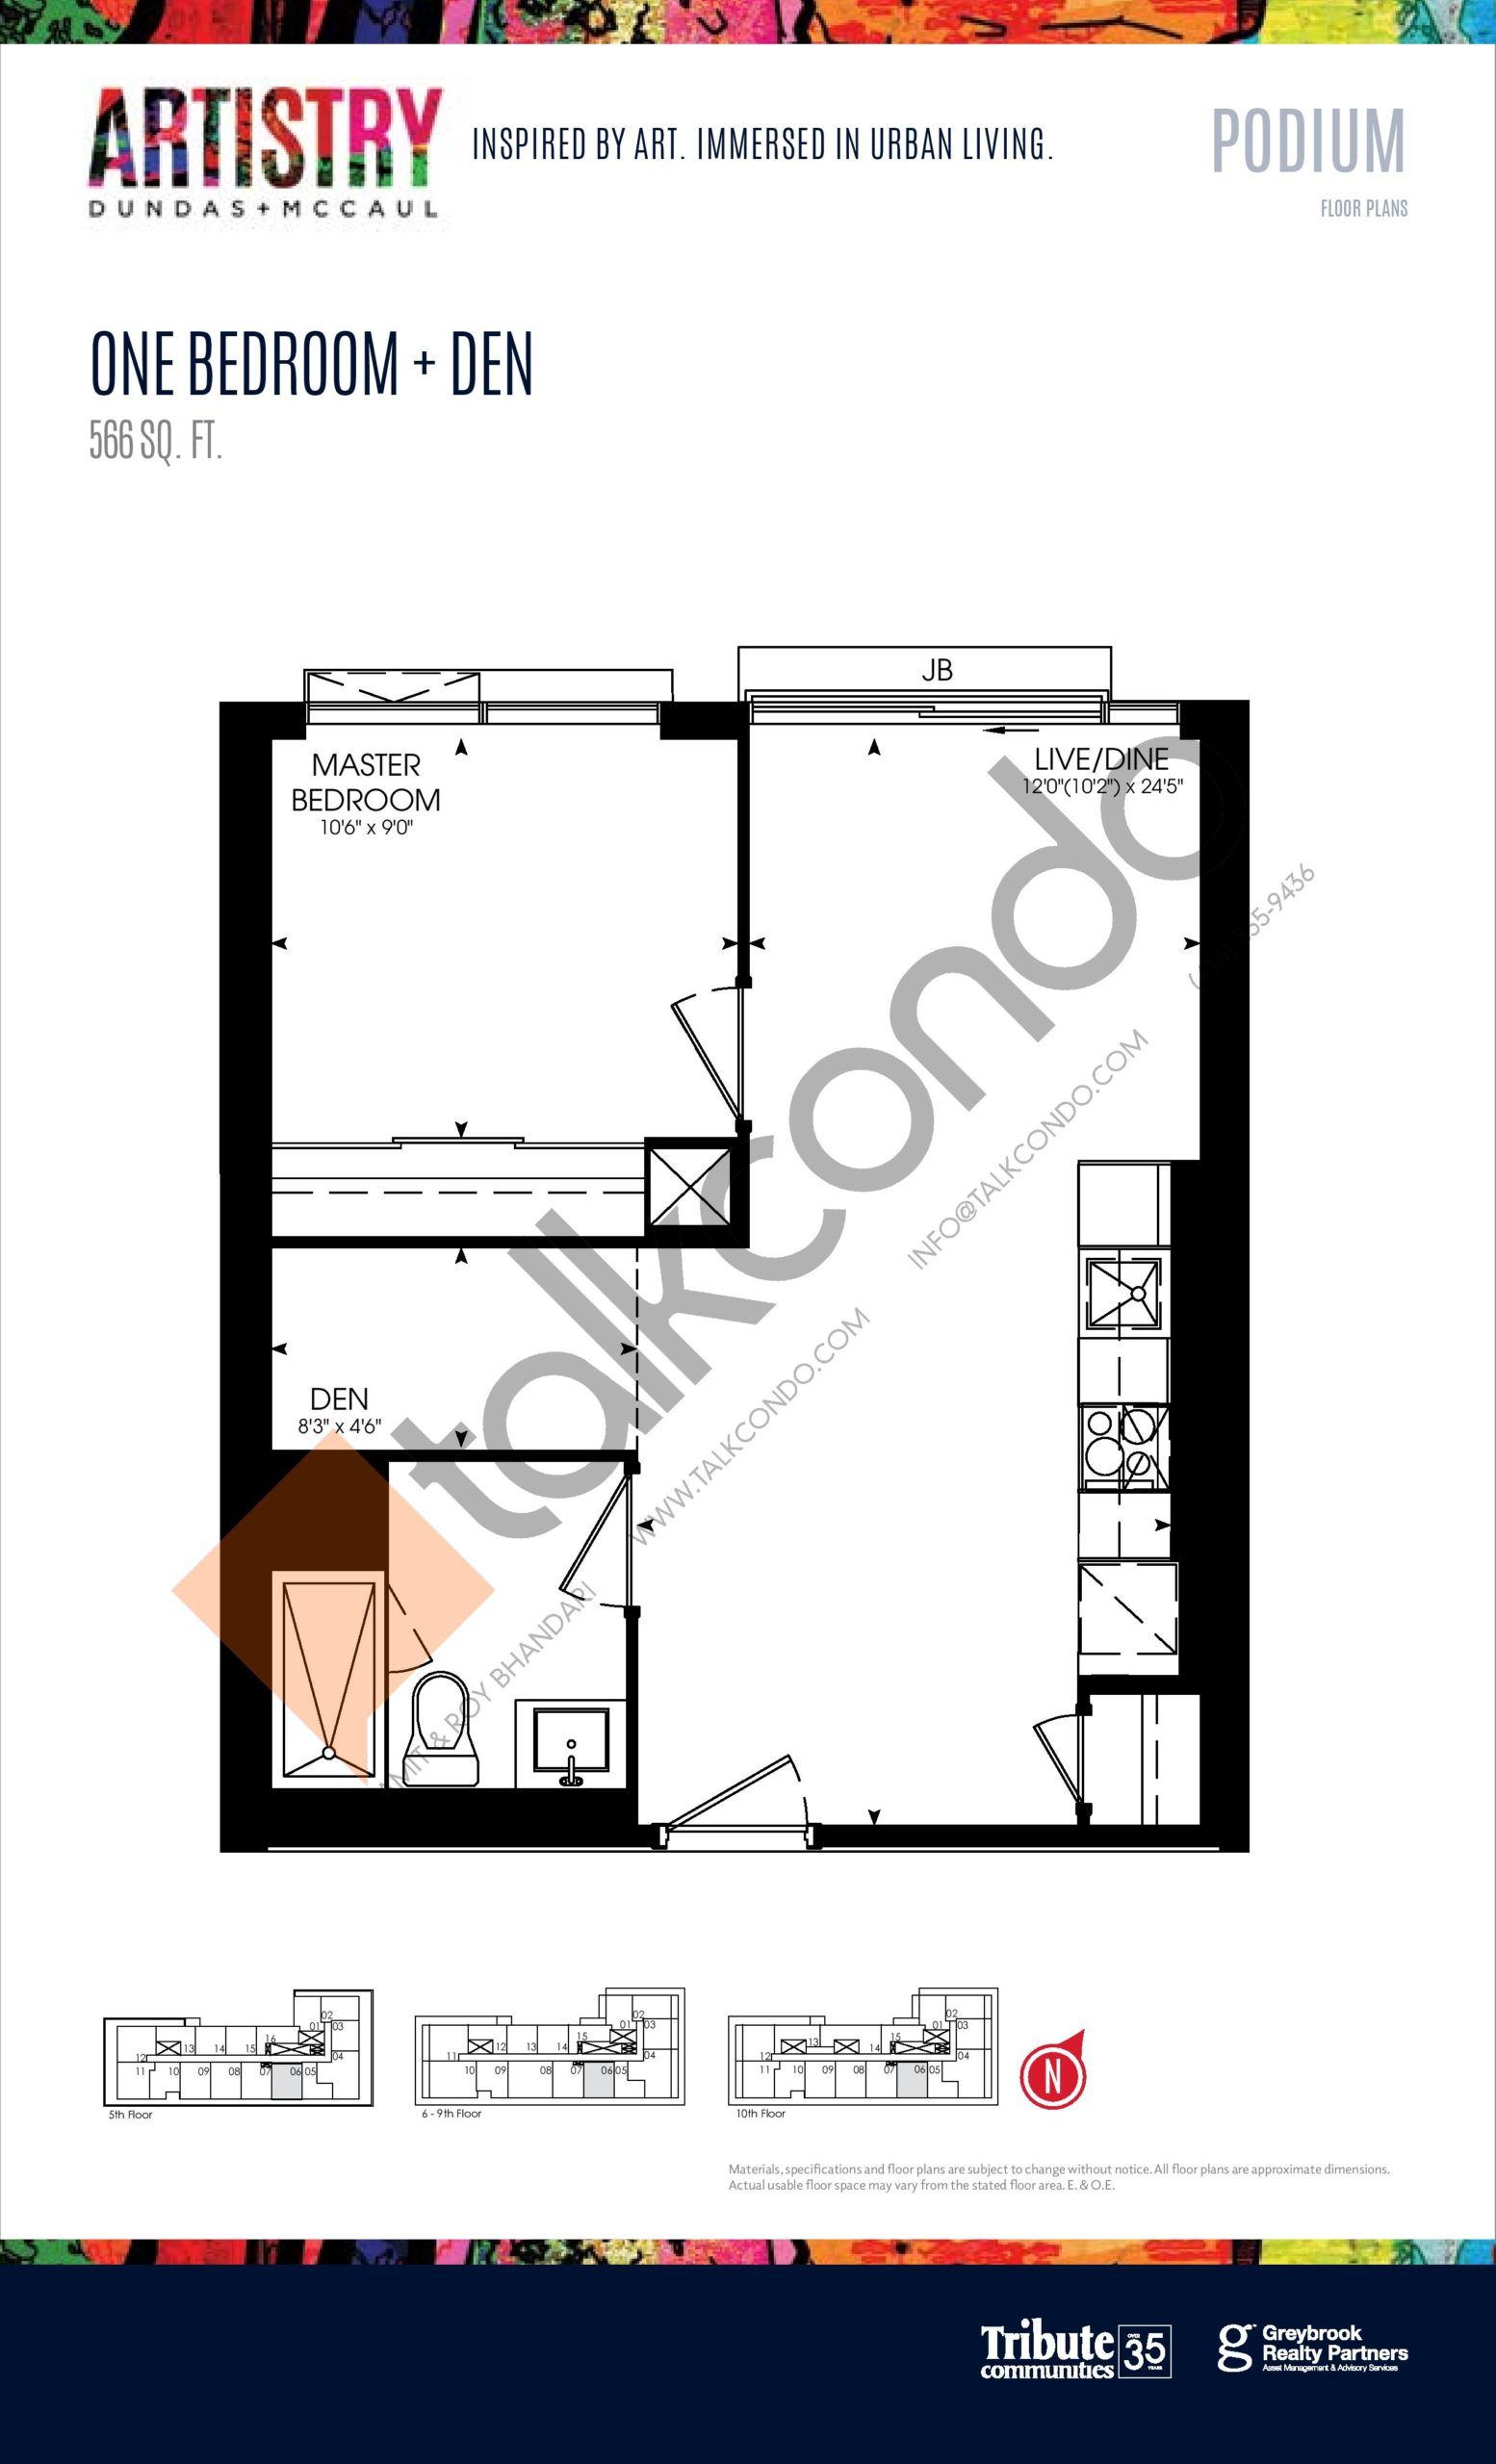 566 sq. ft. - Podium Floor Plan at Artistry Condos - 566 sq.ft